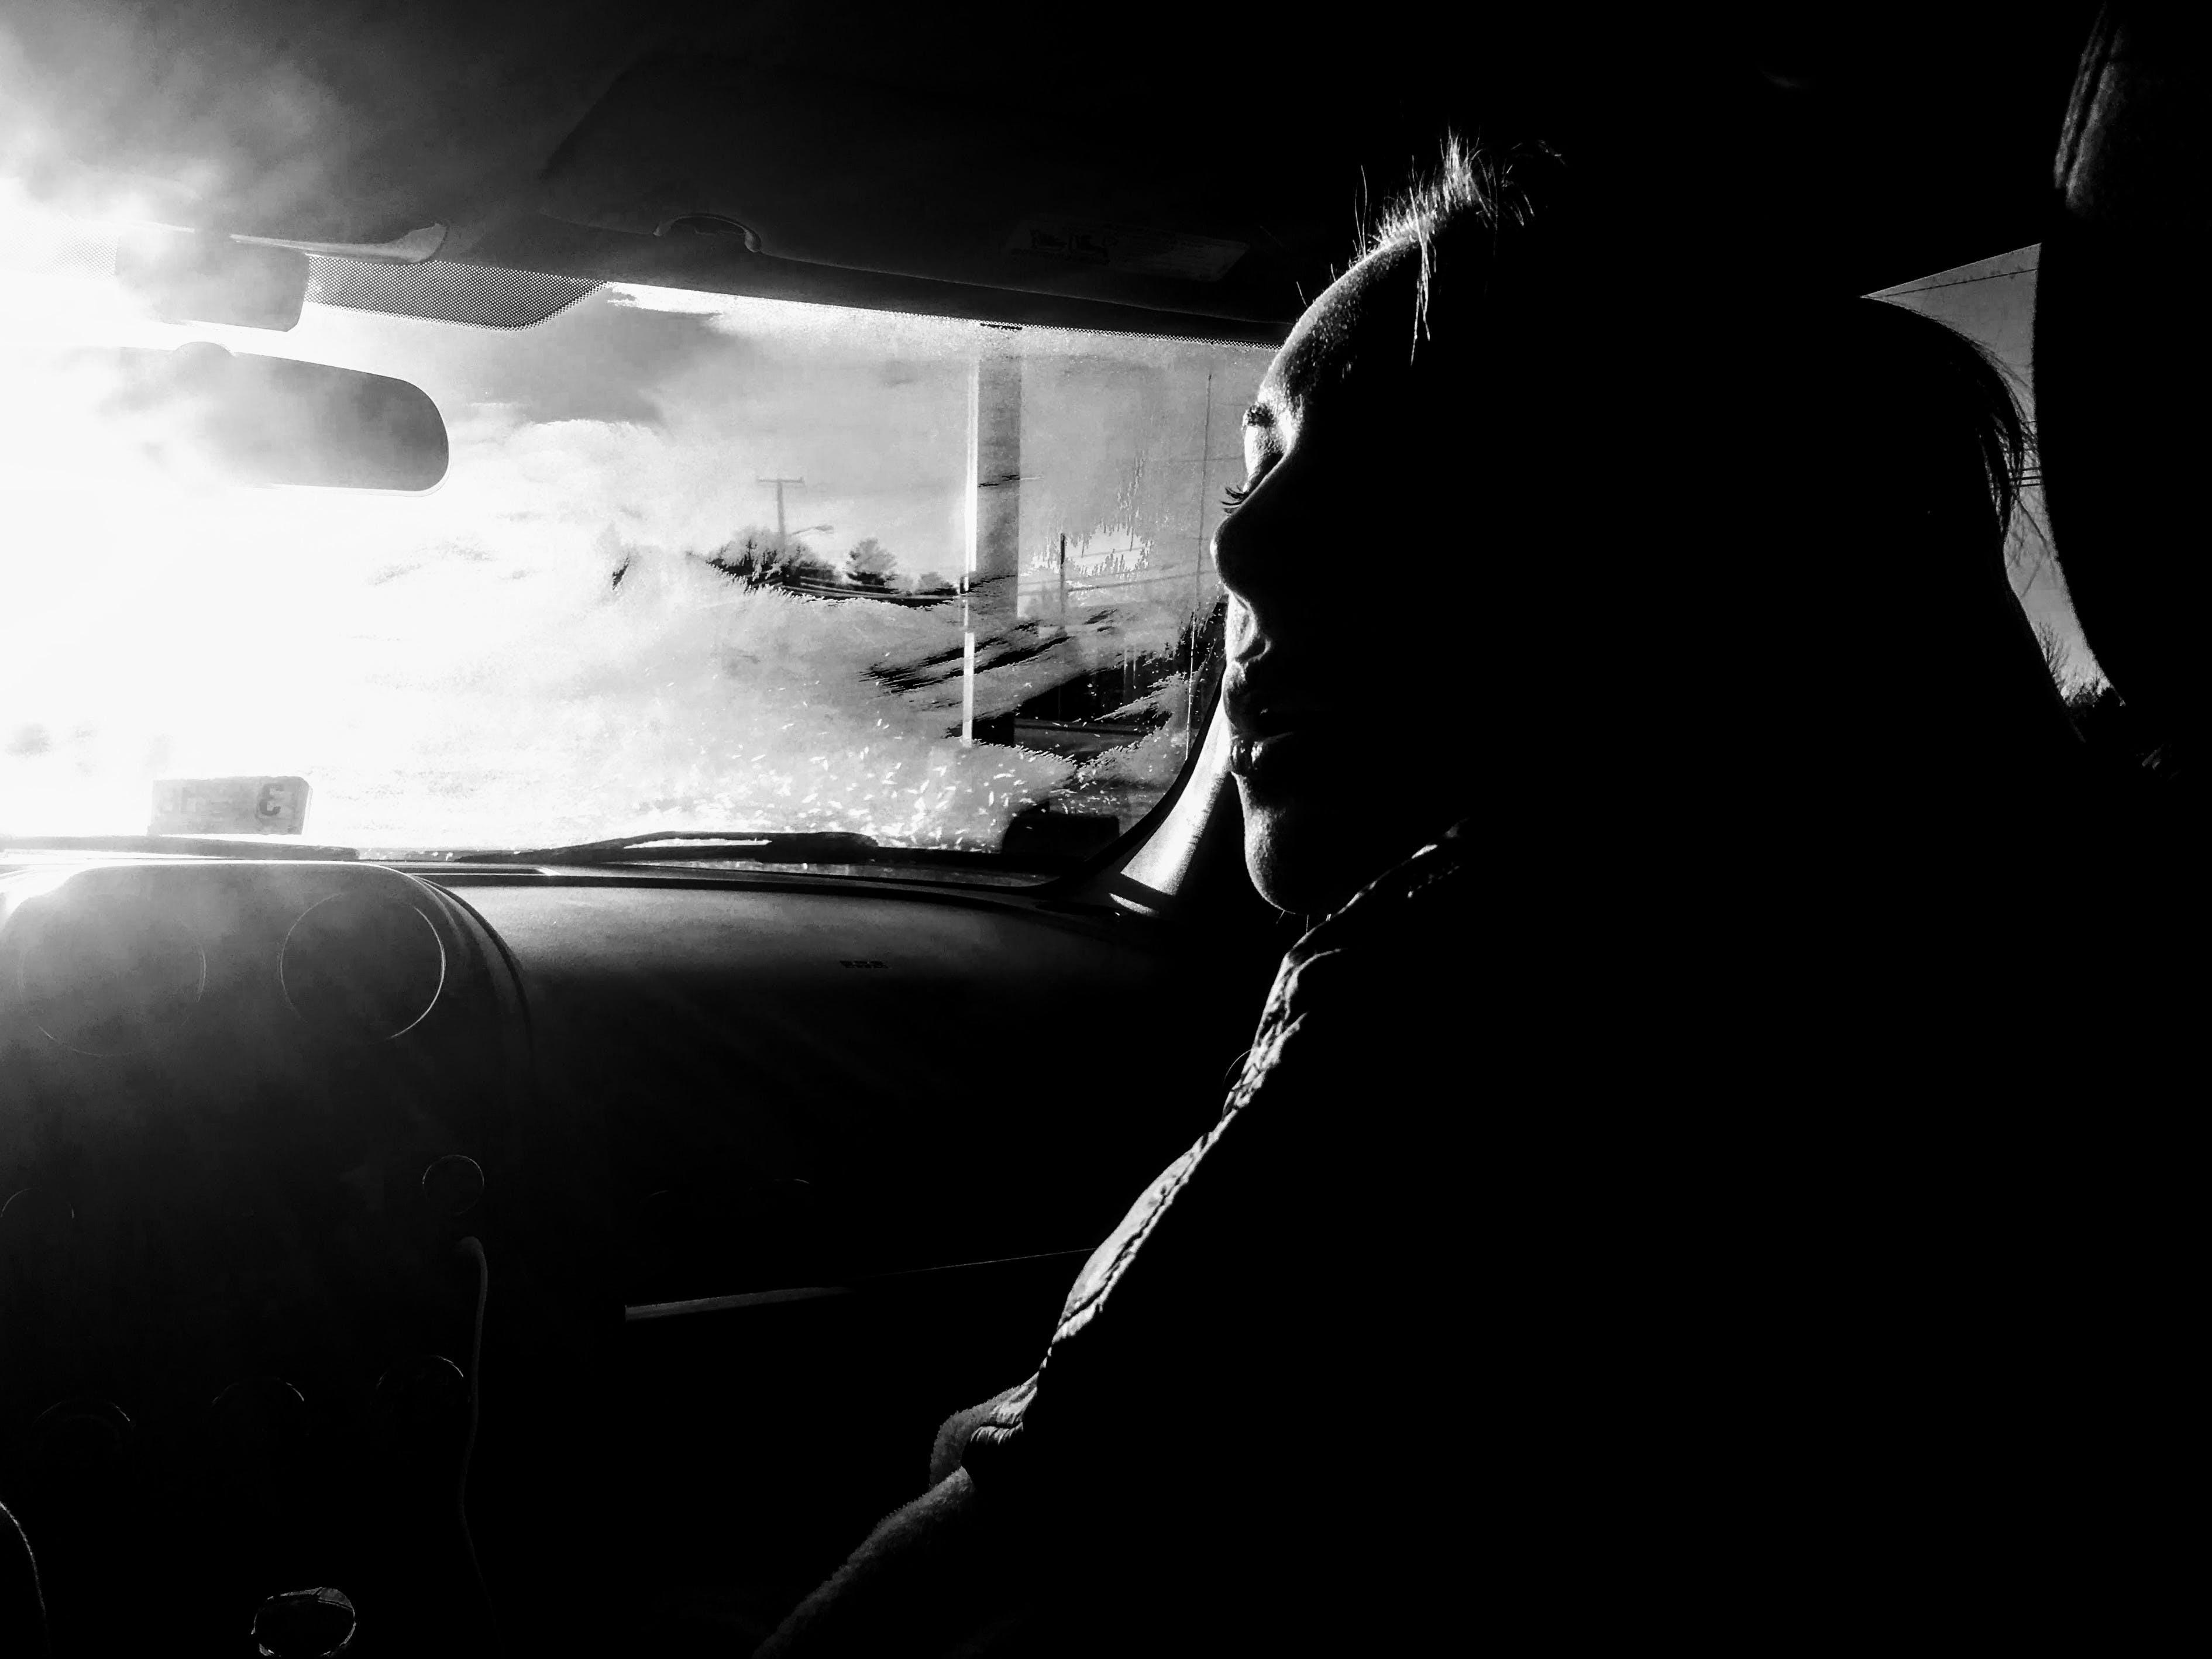 Woman Inside Car Grayscale Photo